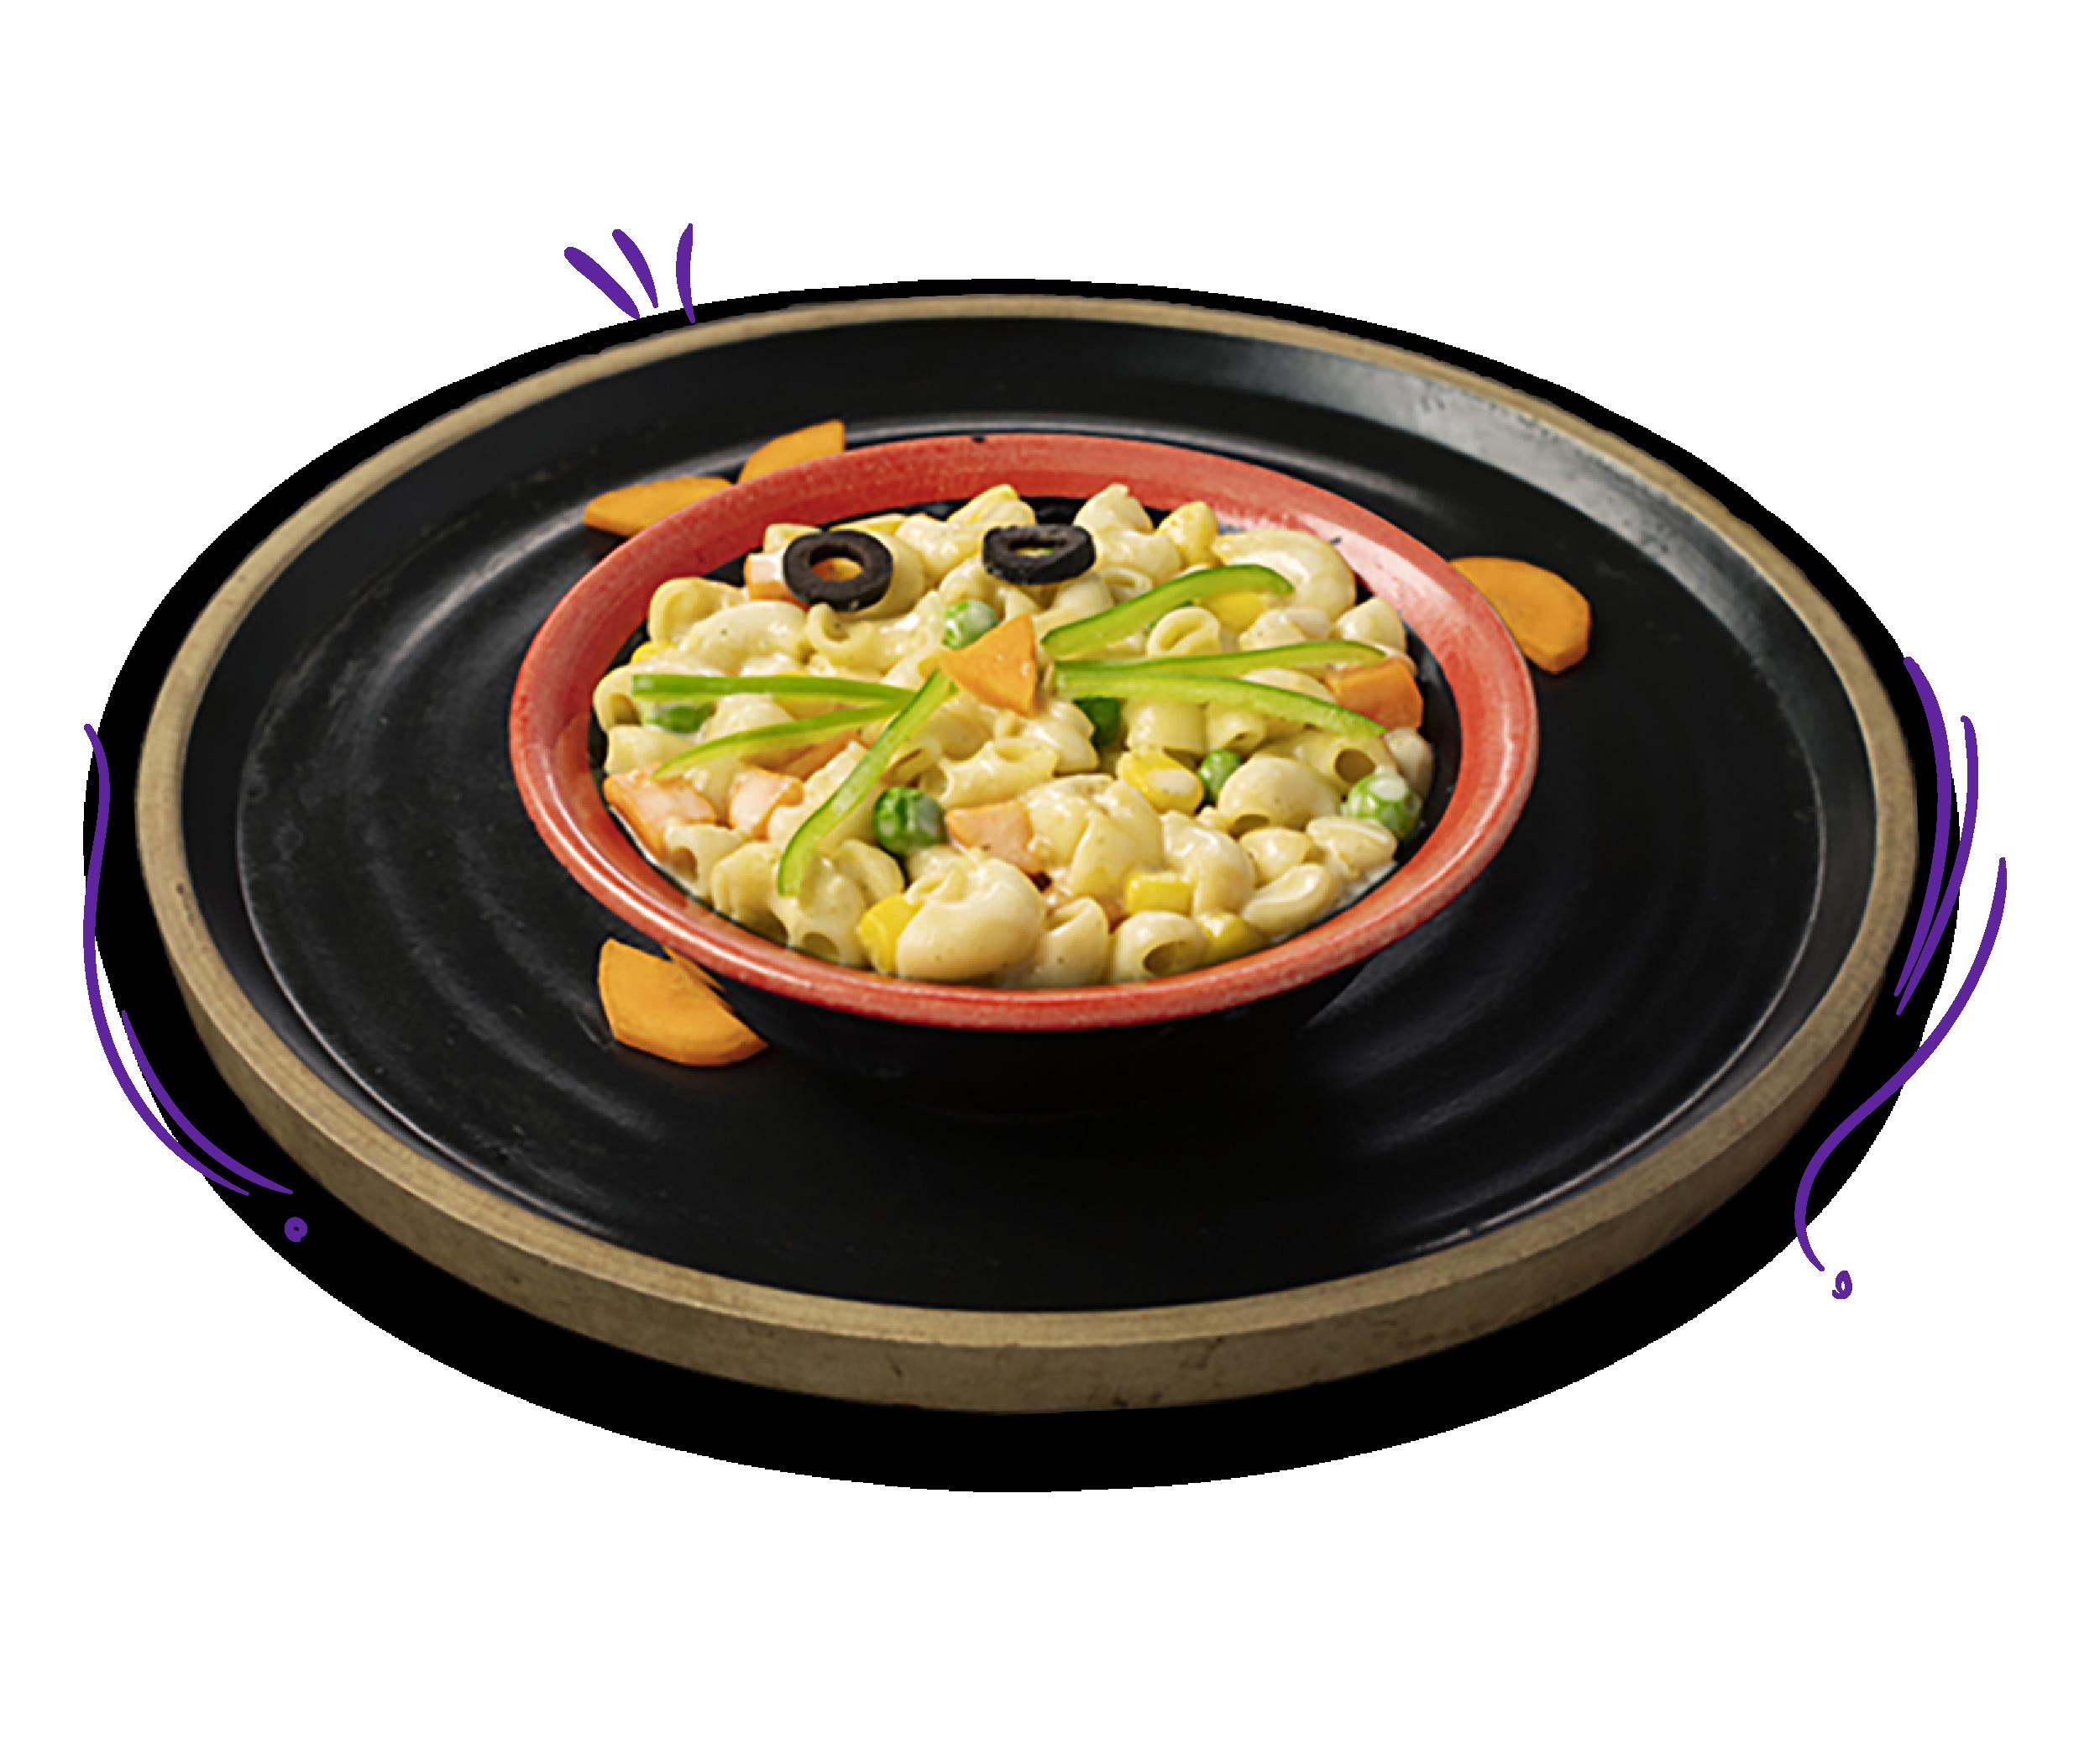 YiPPee! Creamy Pasta Bowl